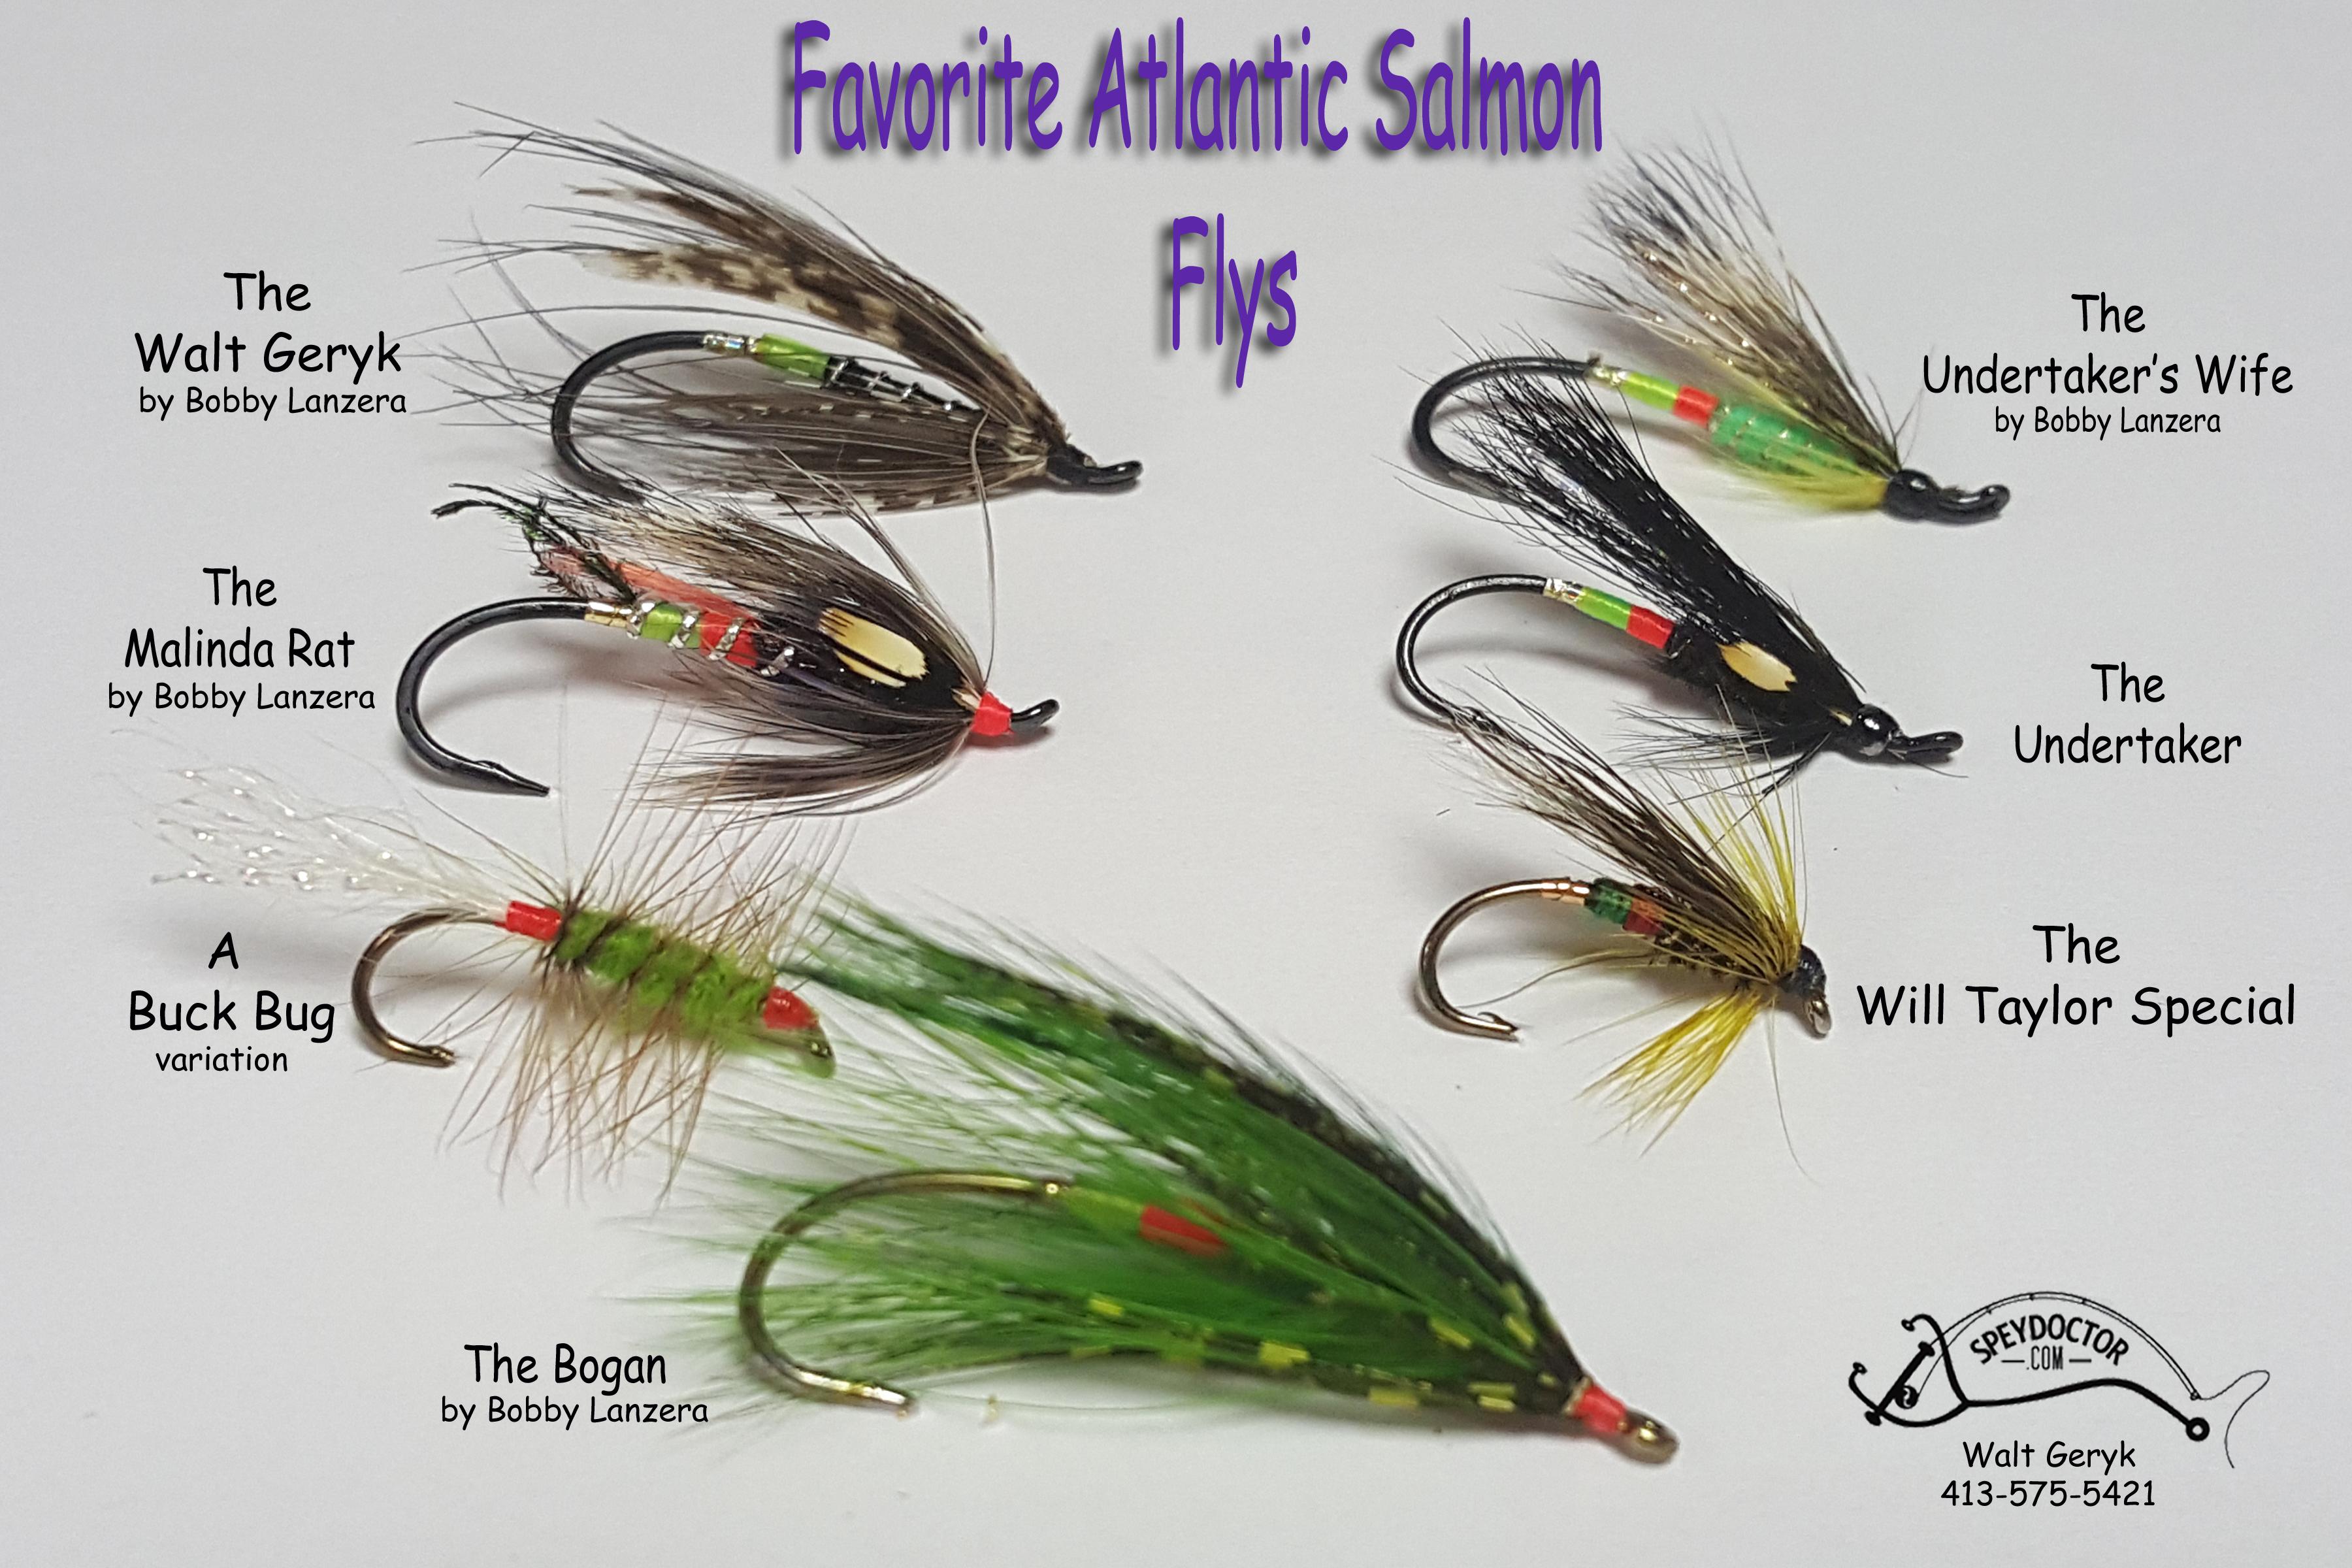 Favorite atlantic dsalmon Flys